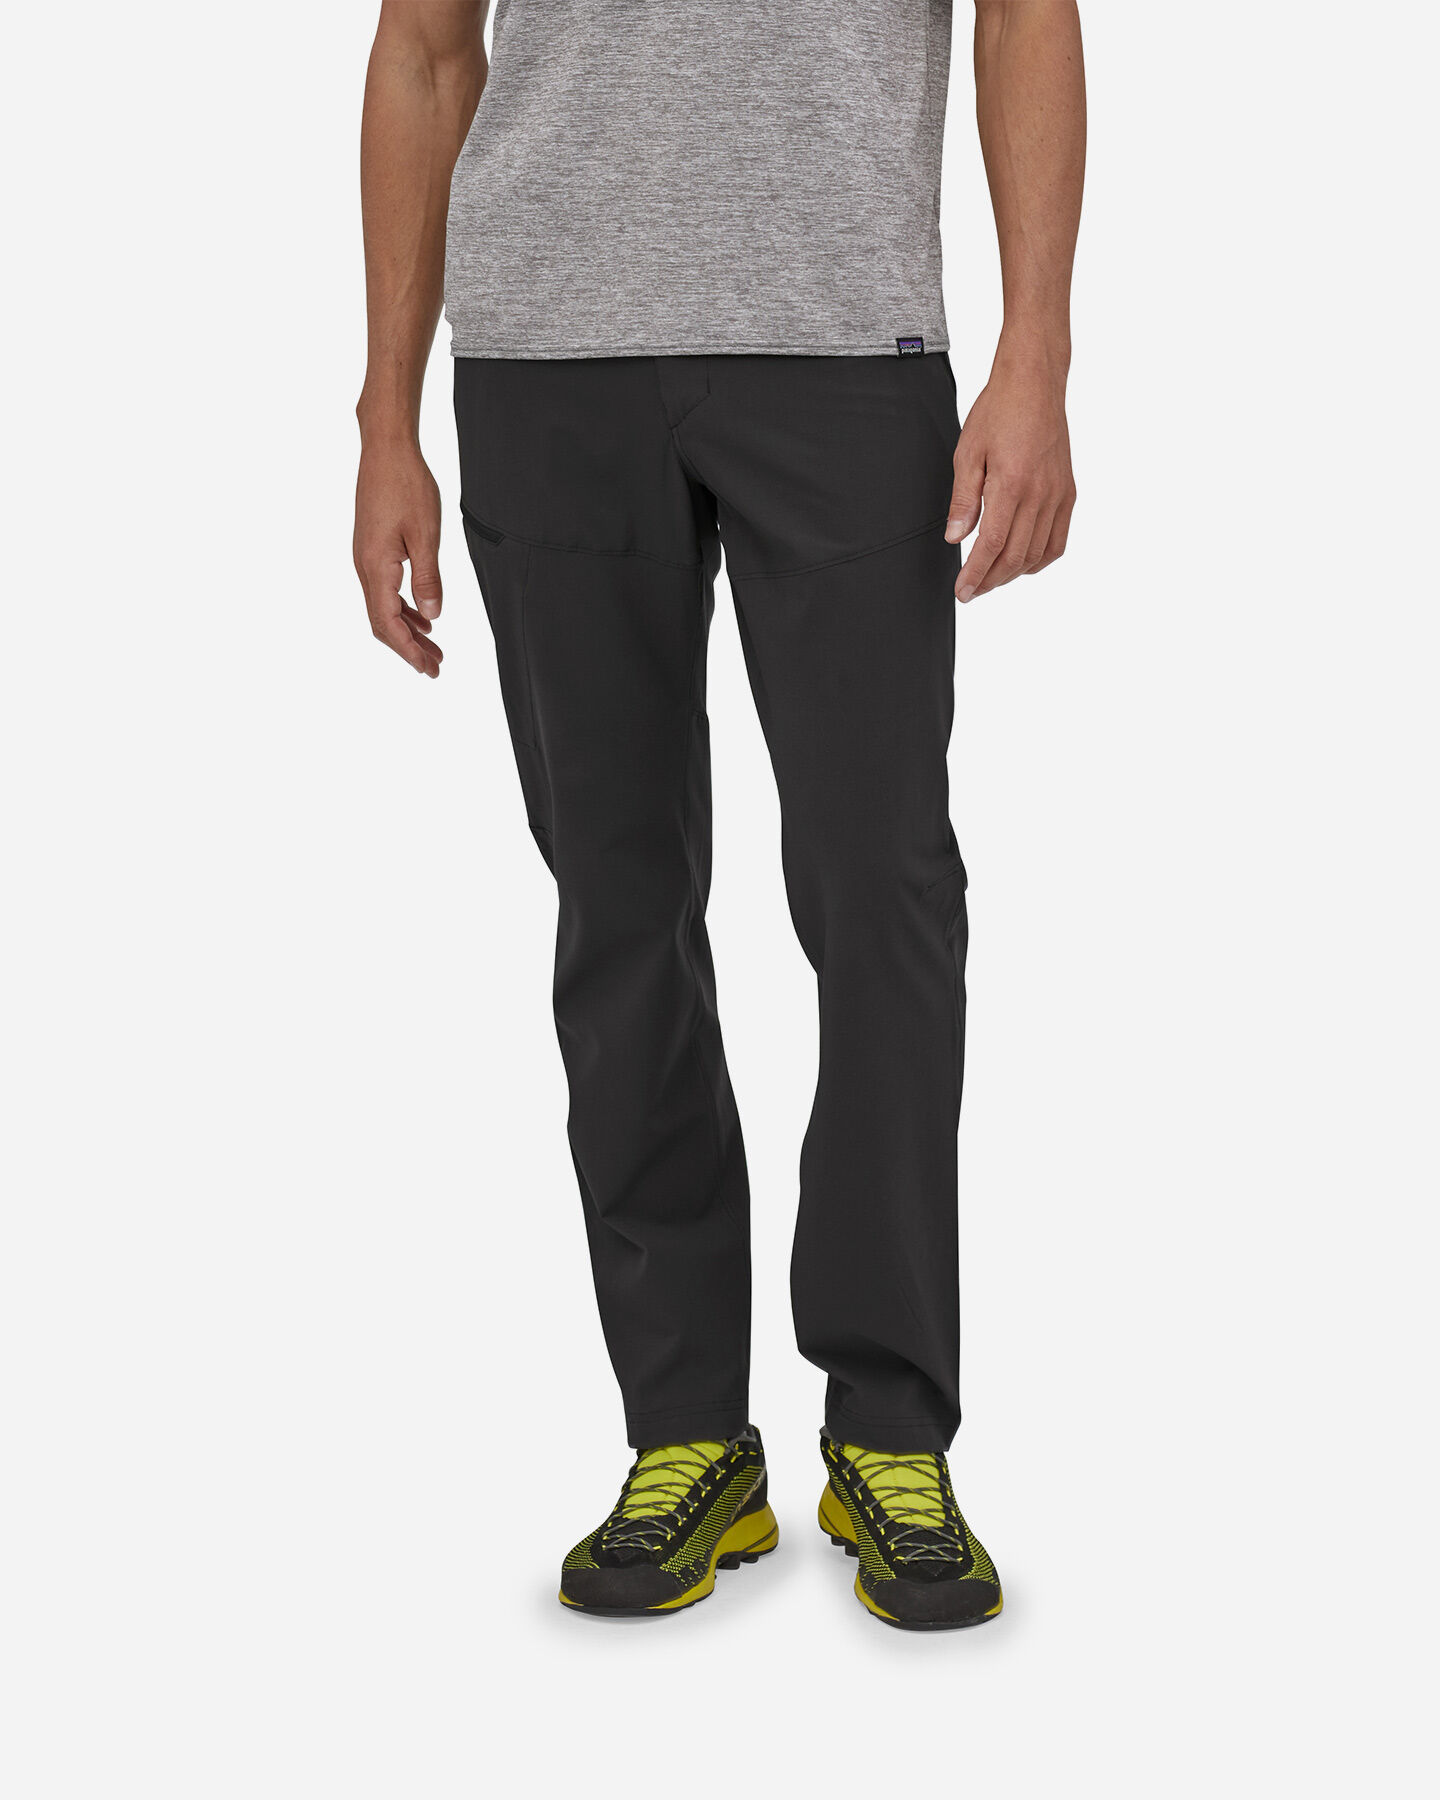 Pantalone outdoor PATAGONIA ALTVIA TRAIL M S4089232 scatto 1